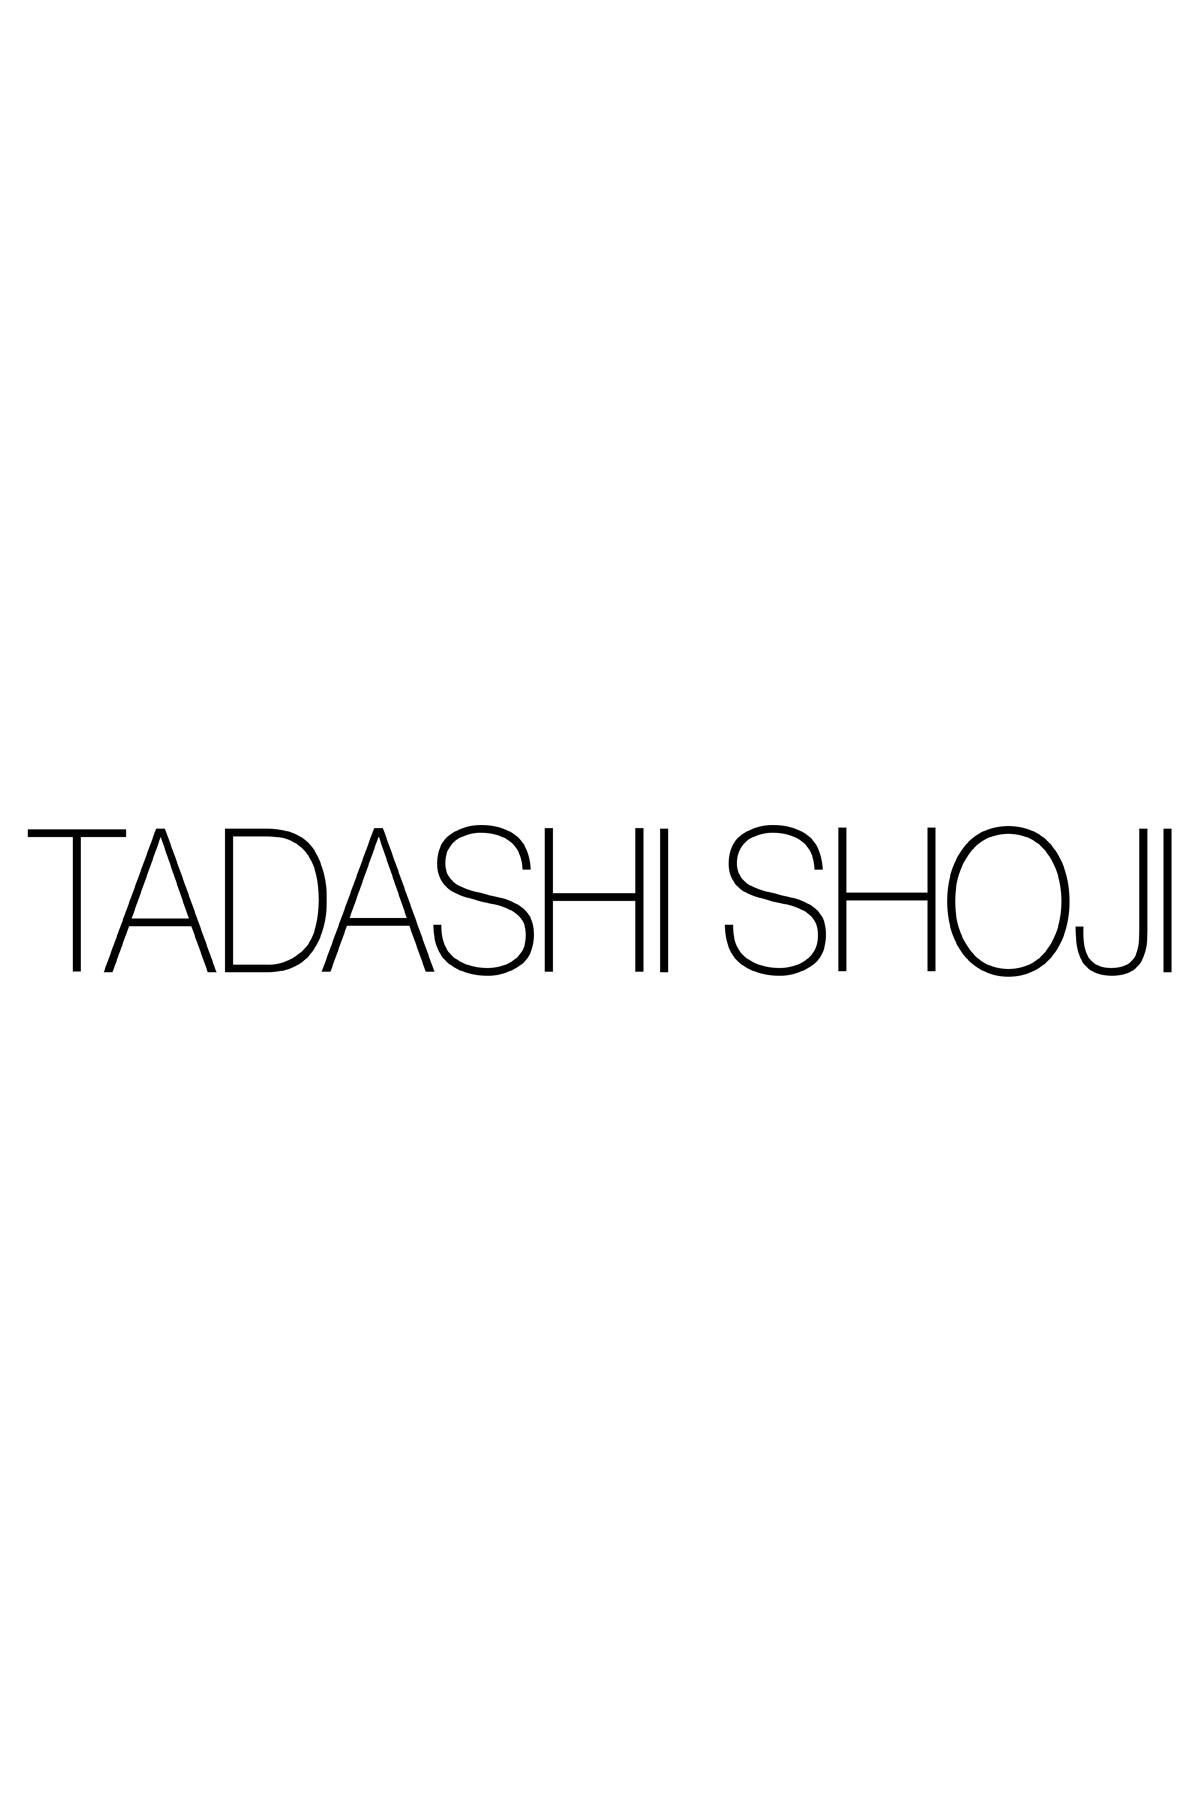 Tadashi Shoji - Nerine Embroidered Crepe Dress - PLUS SIZE